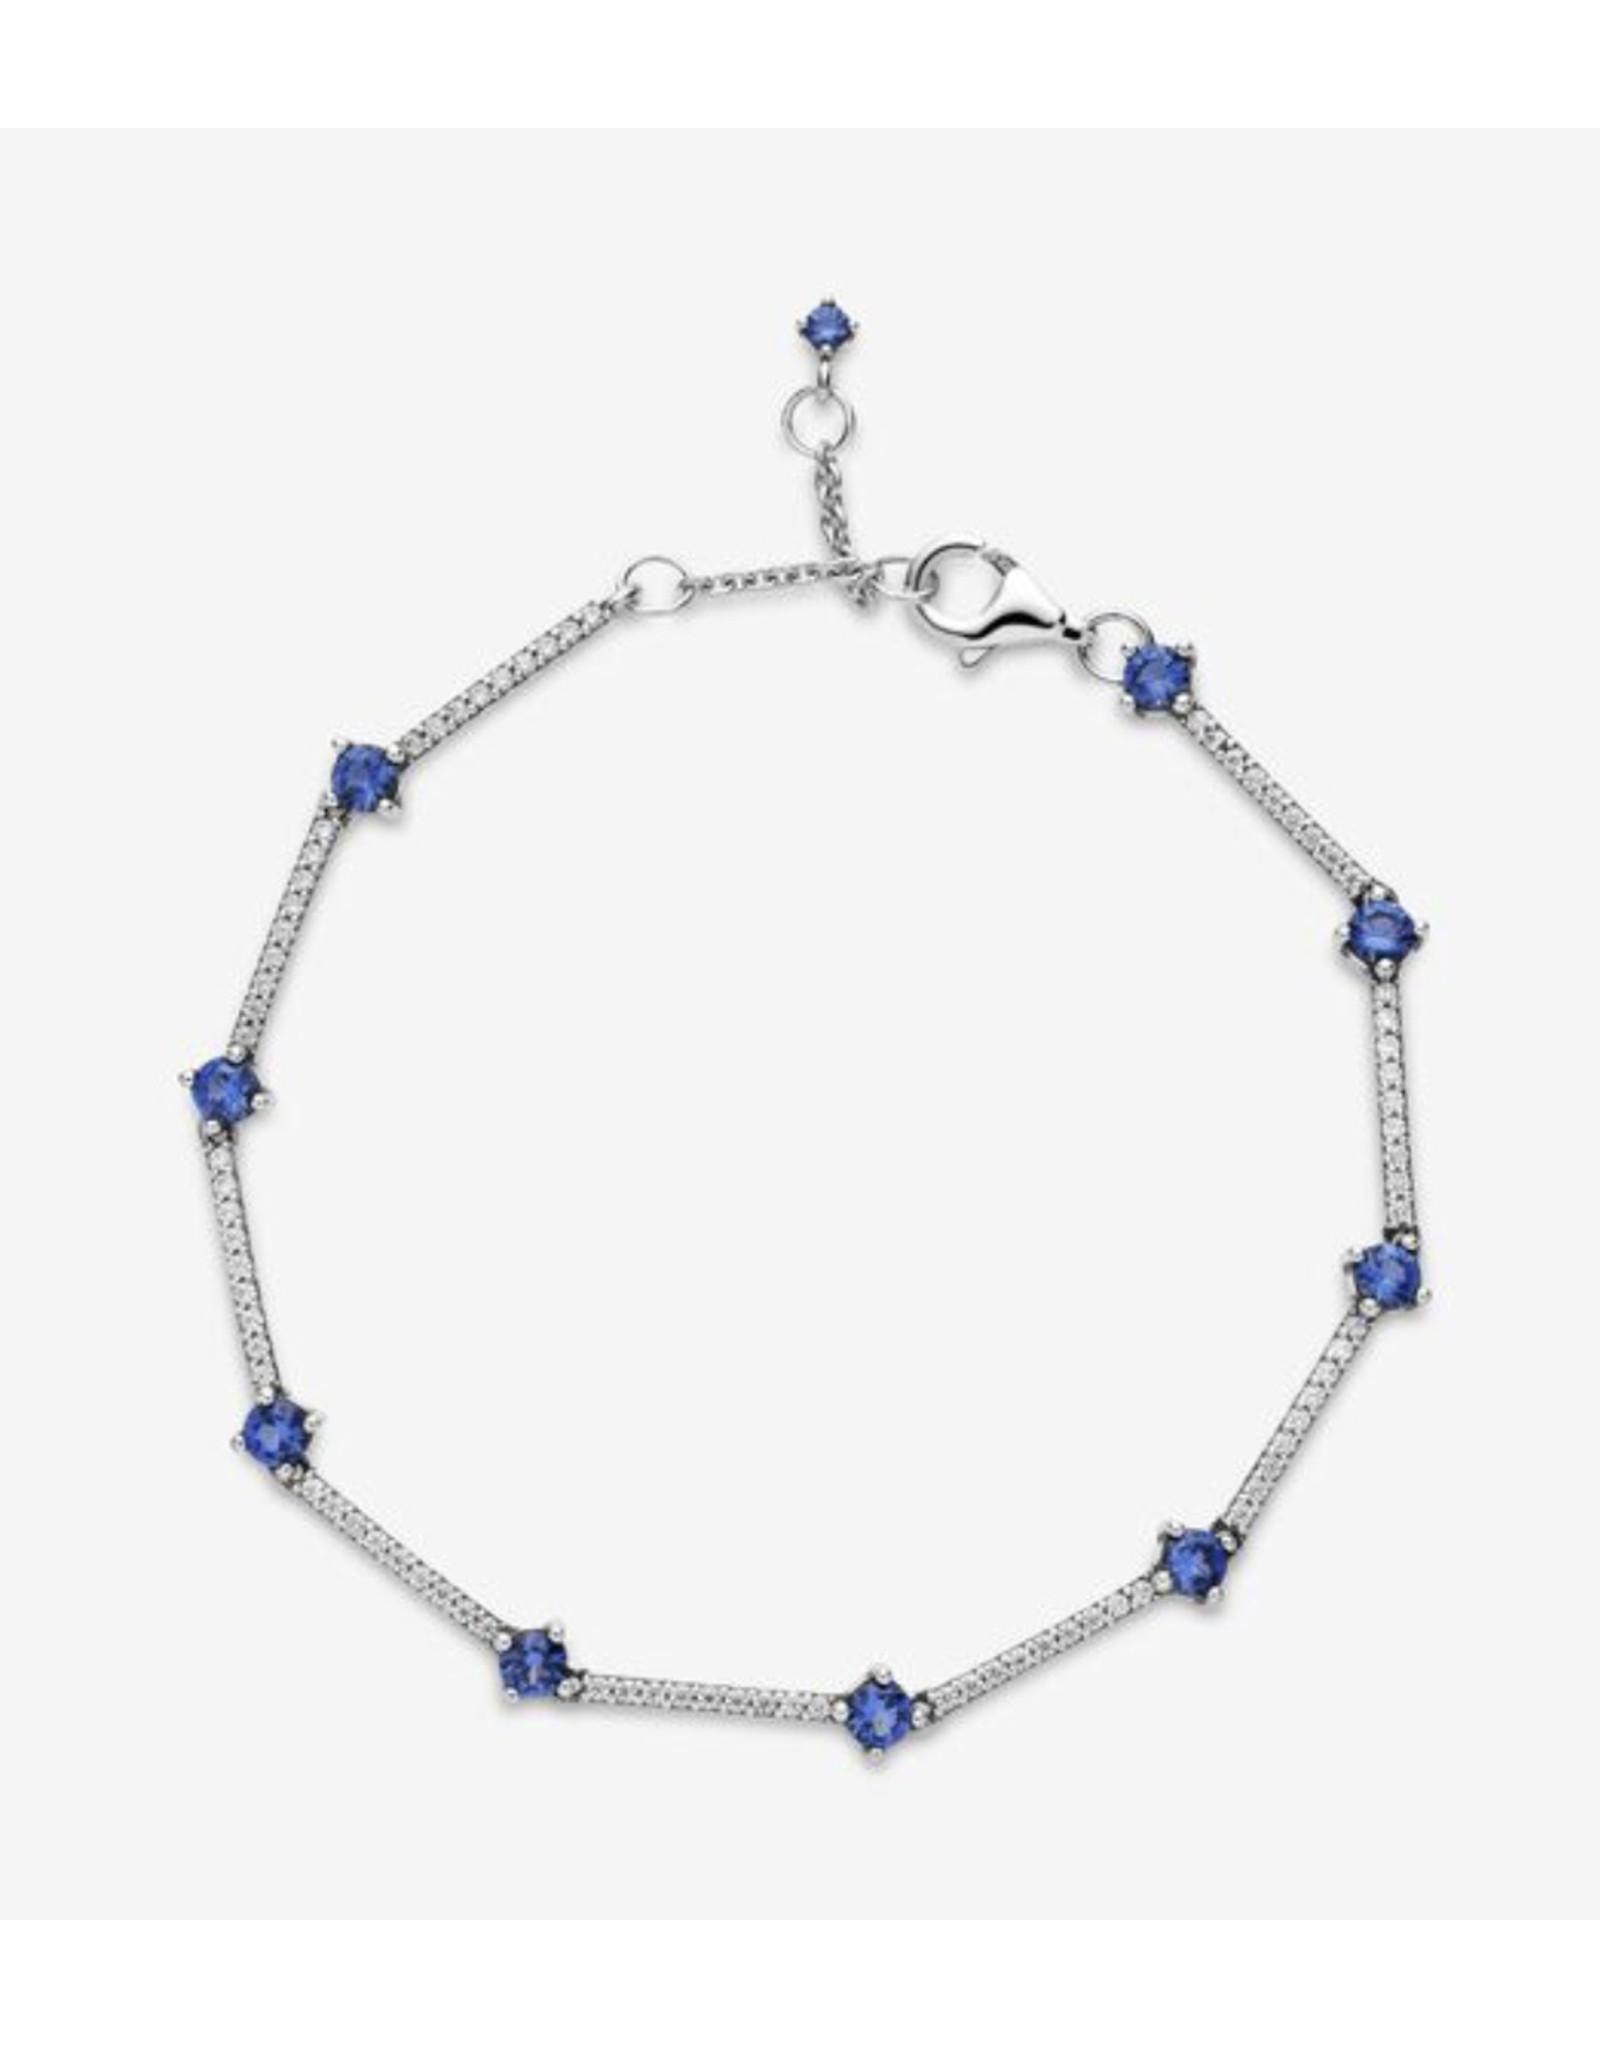 Pandora Pandora Bracelet,599217C01, Sparkling Pave Bars, Blue&Clear CZ